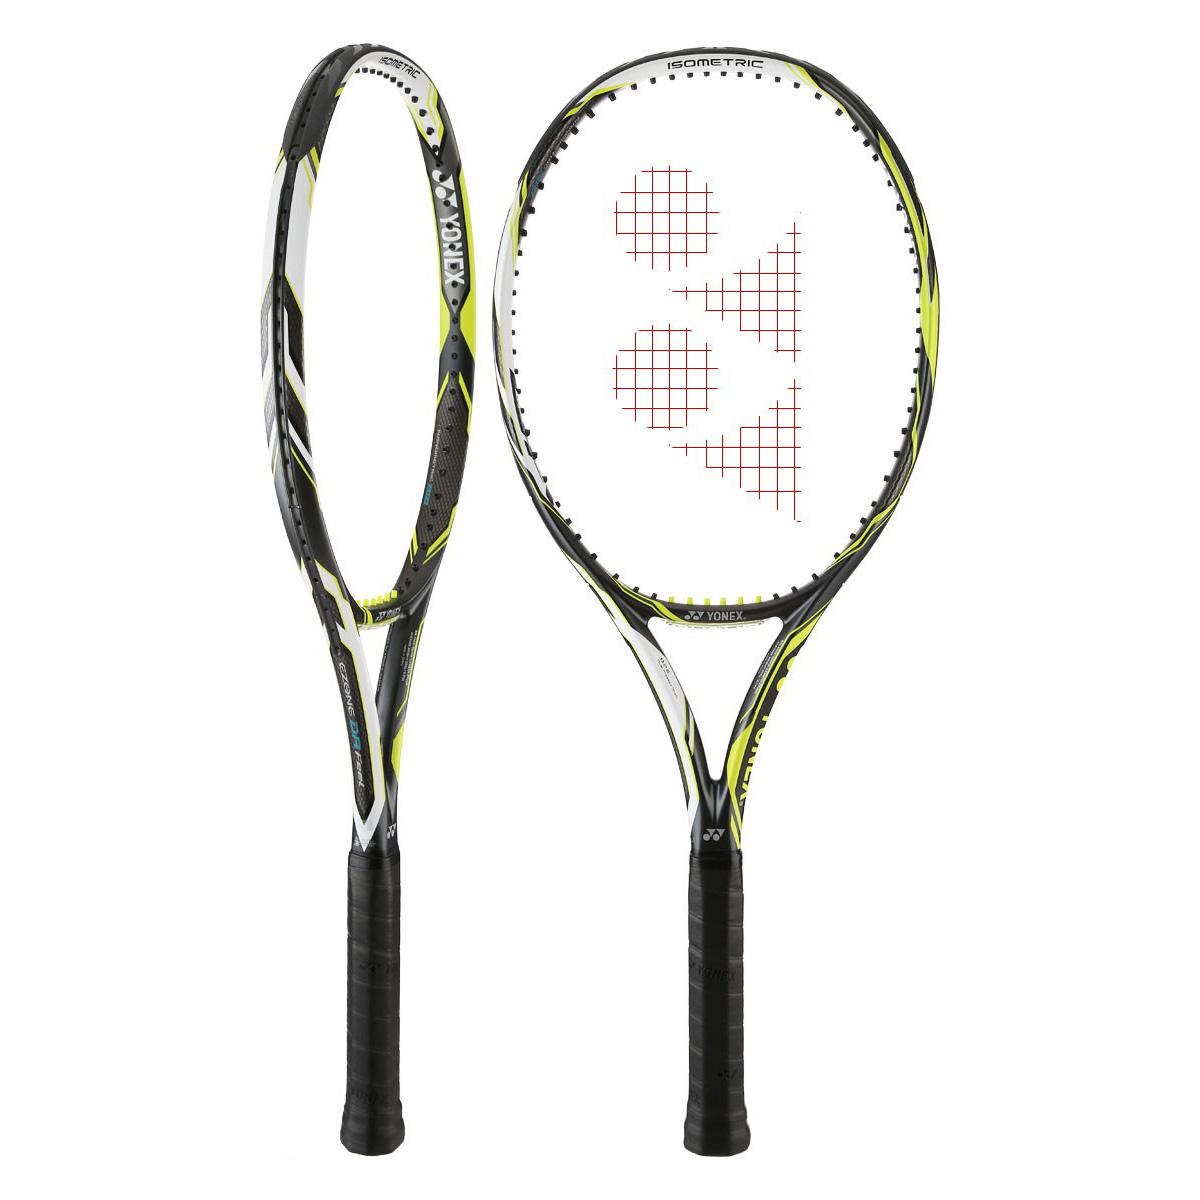 Pro/'s Pro A Partir De Raquete De Tênis Squash Badminton Raquete ferramentas paras cordas